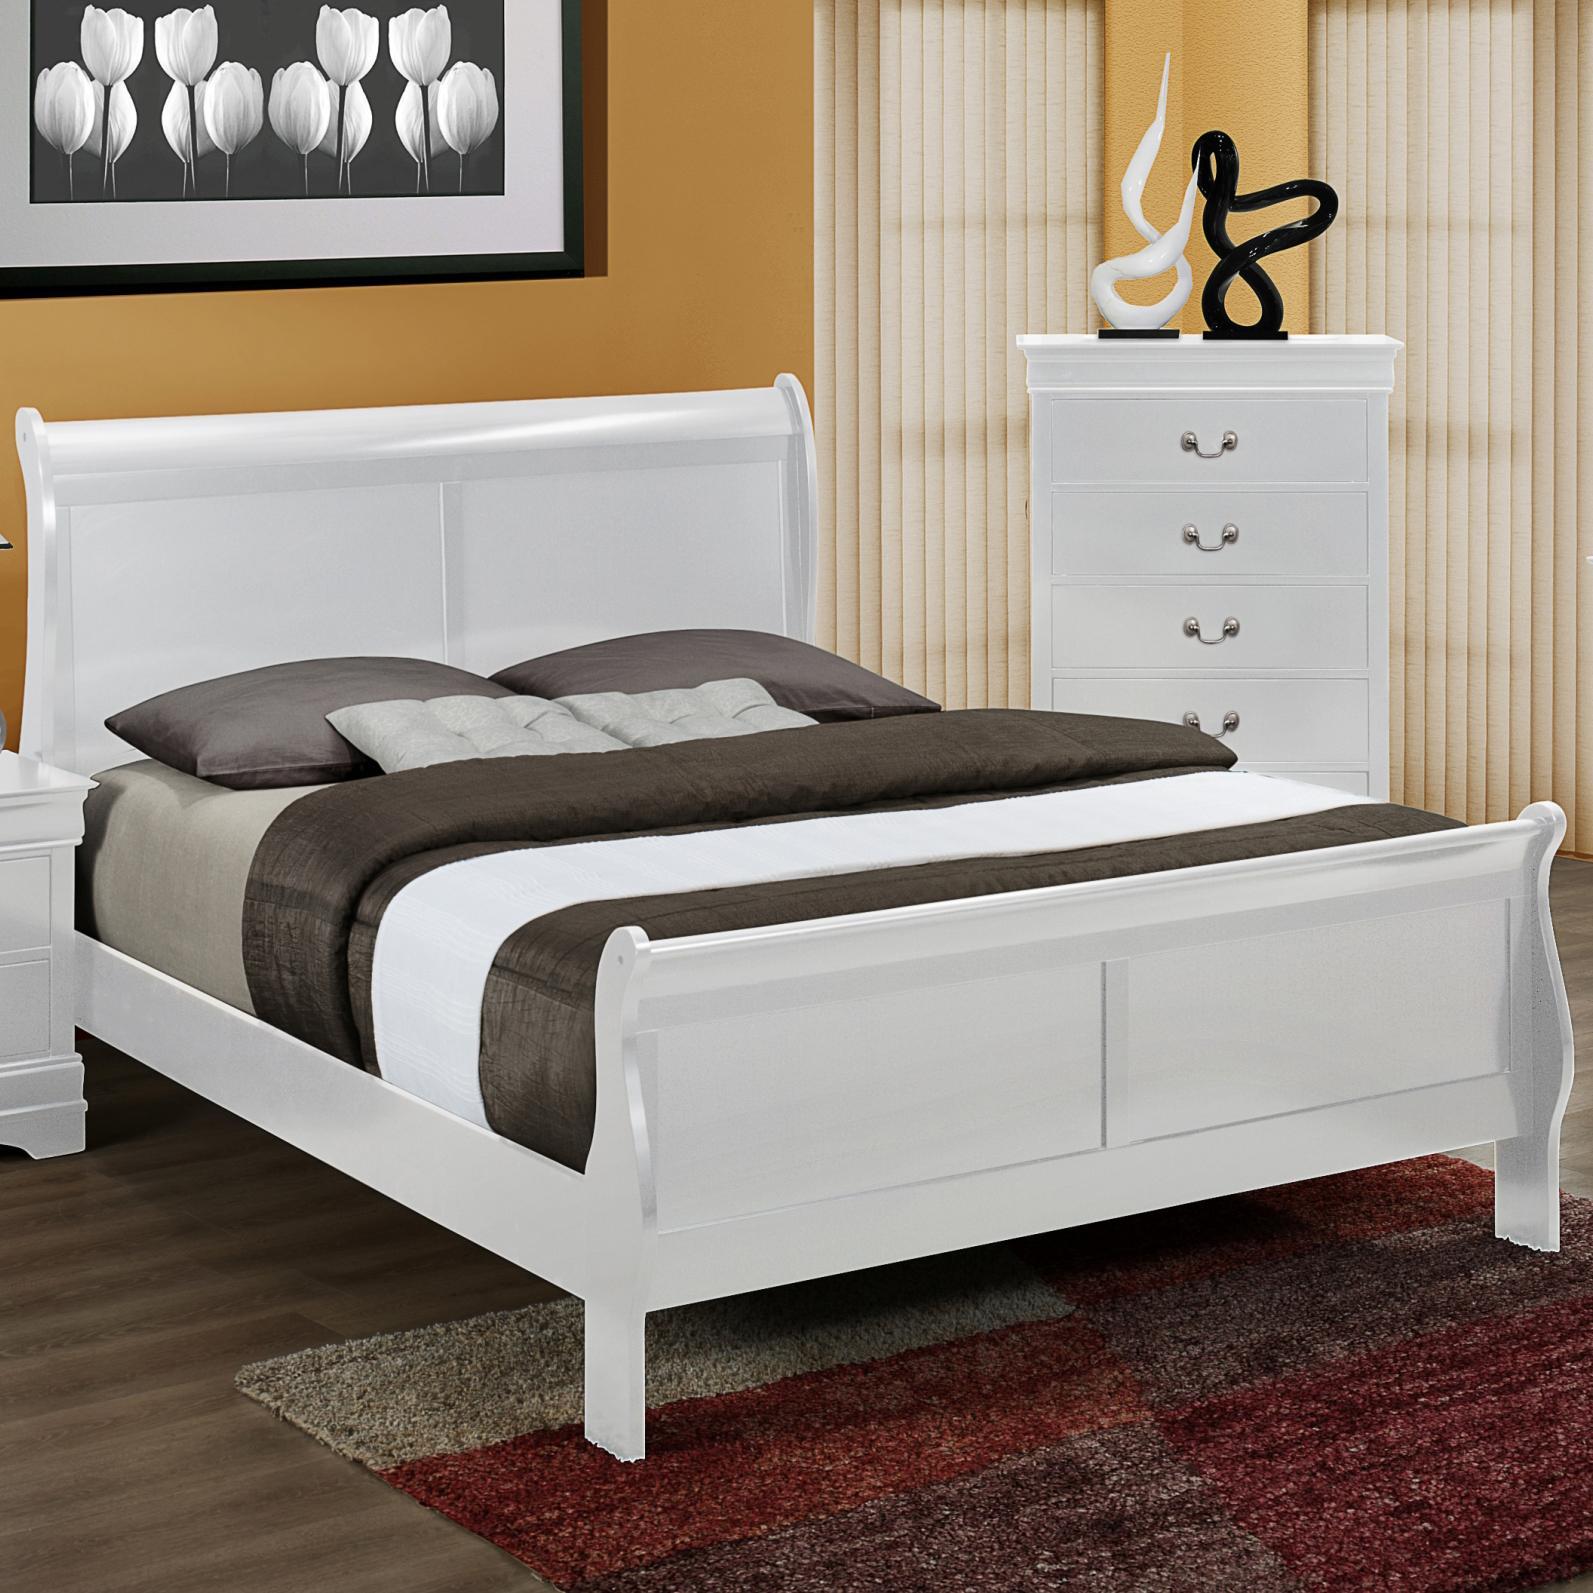 Crown Mark Louis Phillipe King Bed - Item Number: B3600-K-HBFB+RAIL